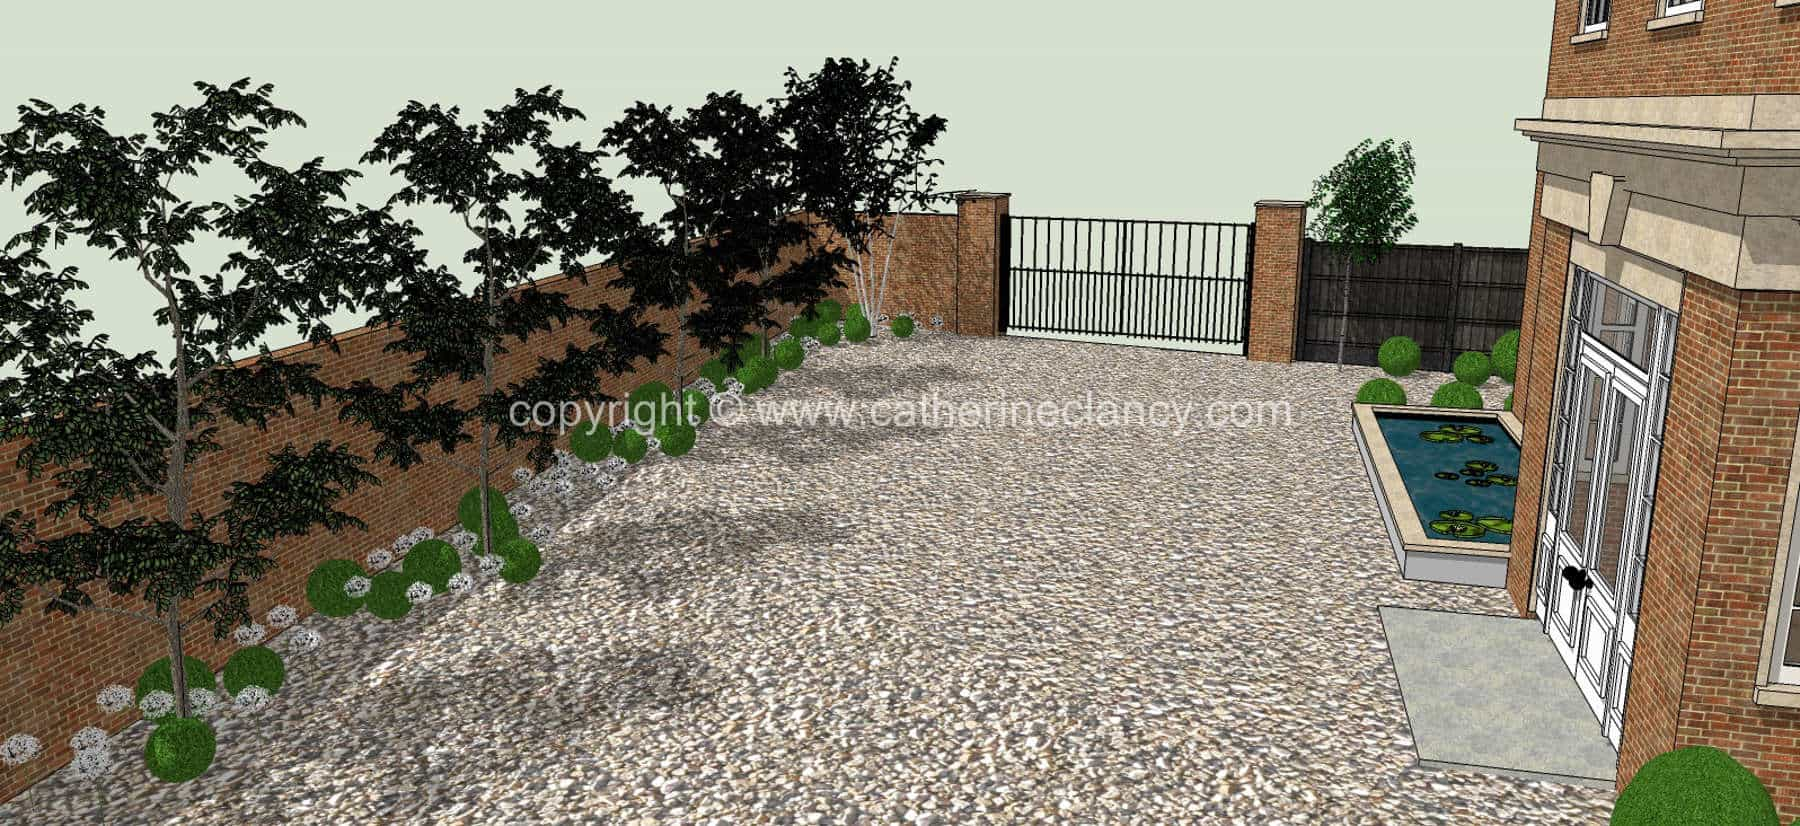 hendon-grand-design-garden-11